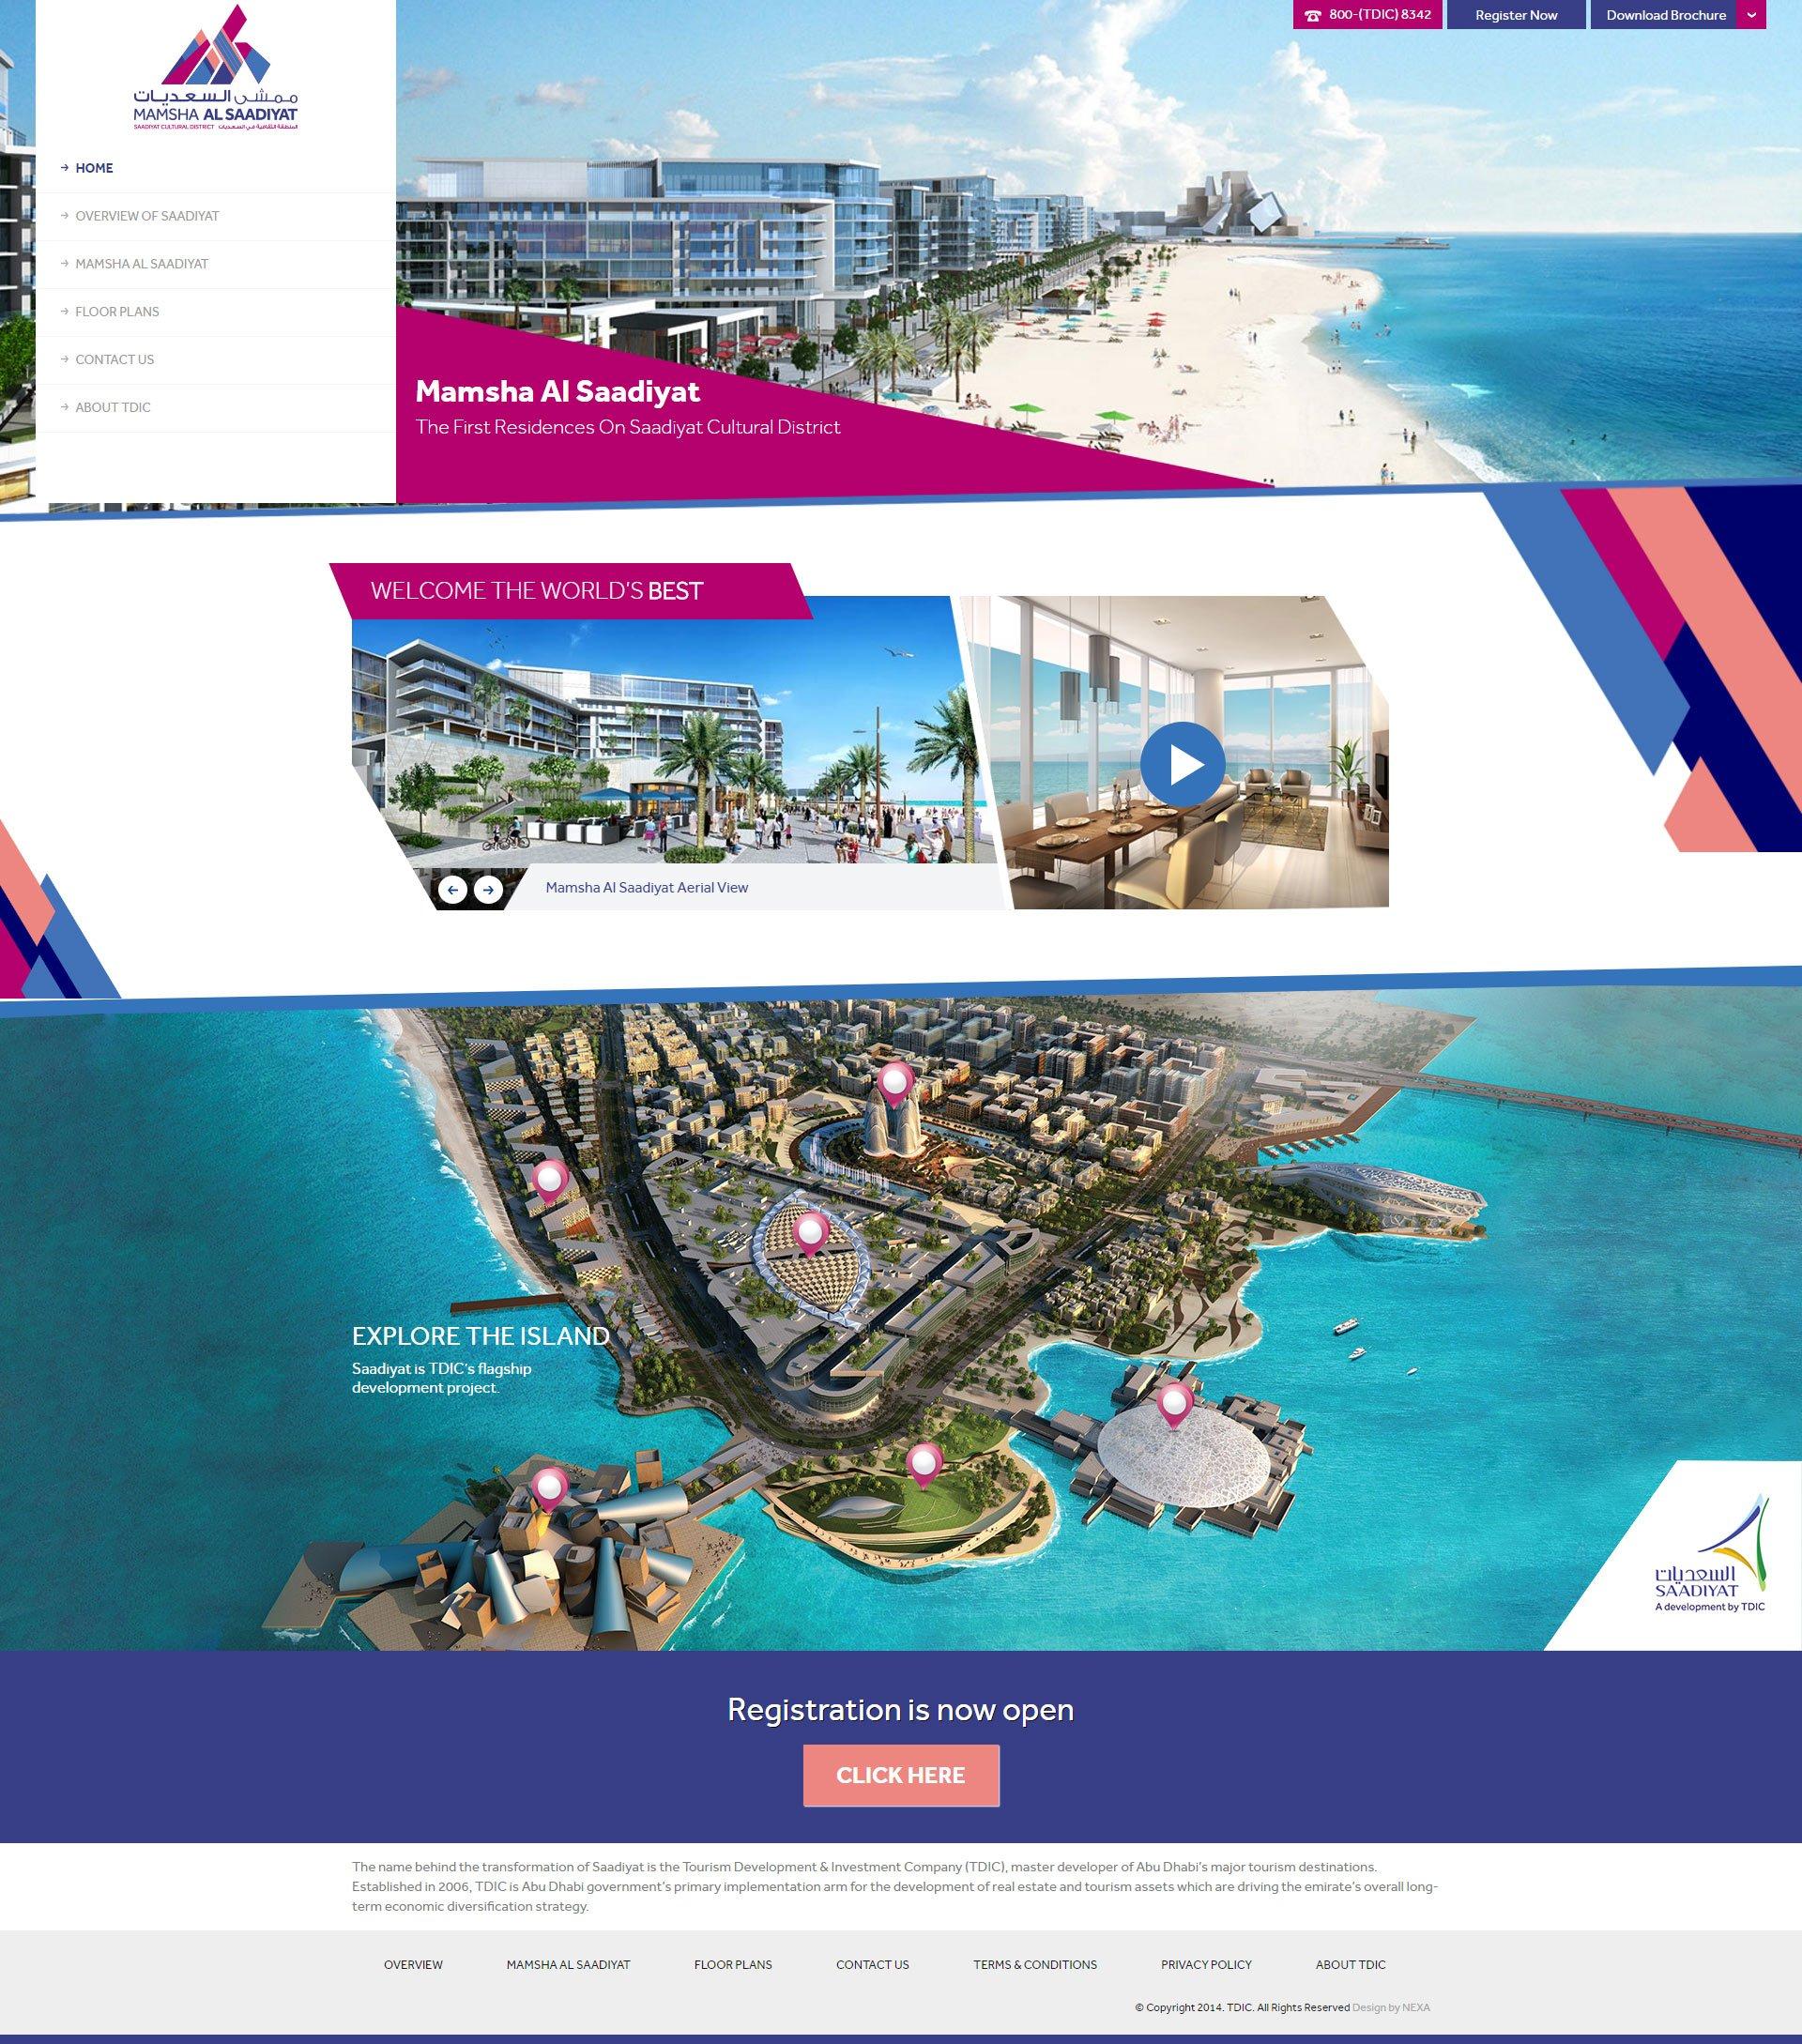 Mamsha Al Saadiyat Website by Nexa, Dubai.jpg